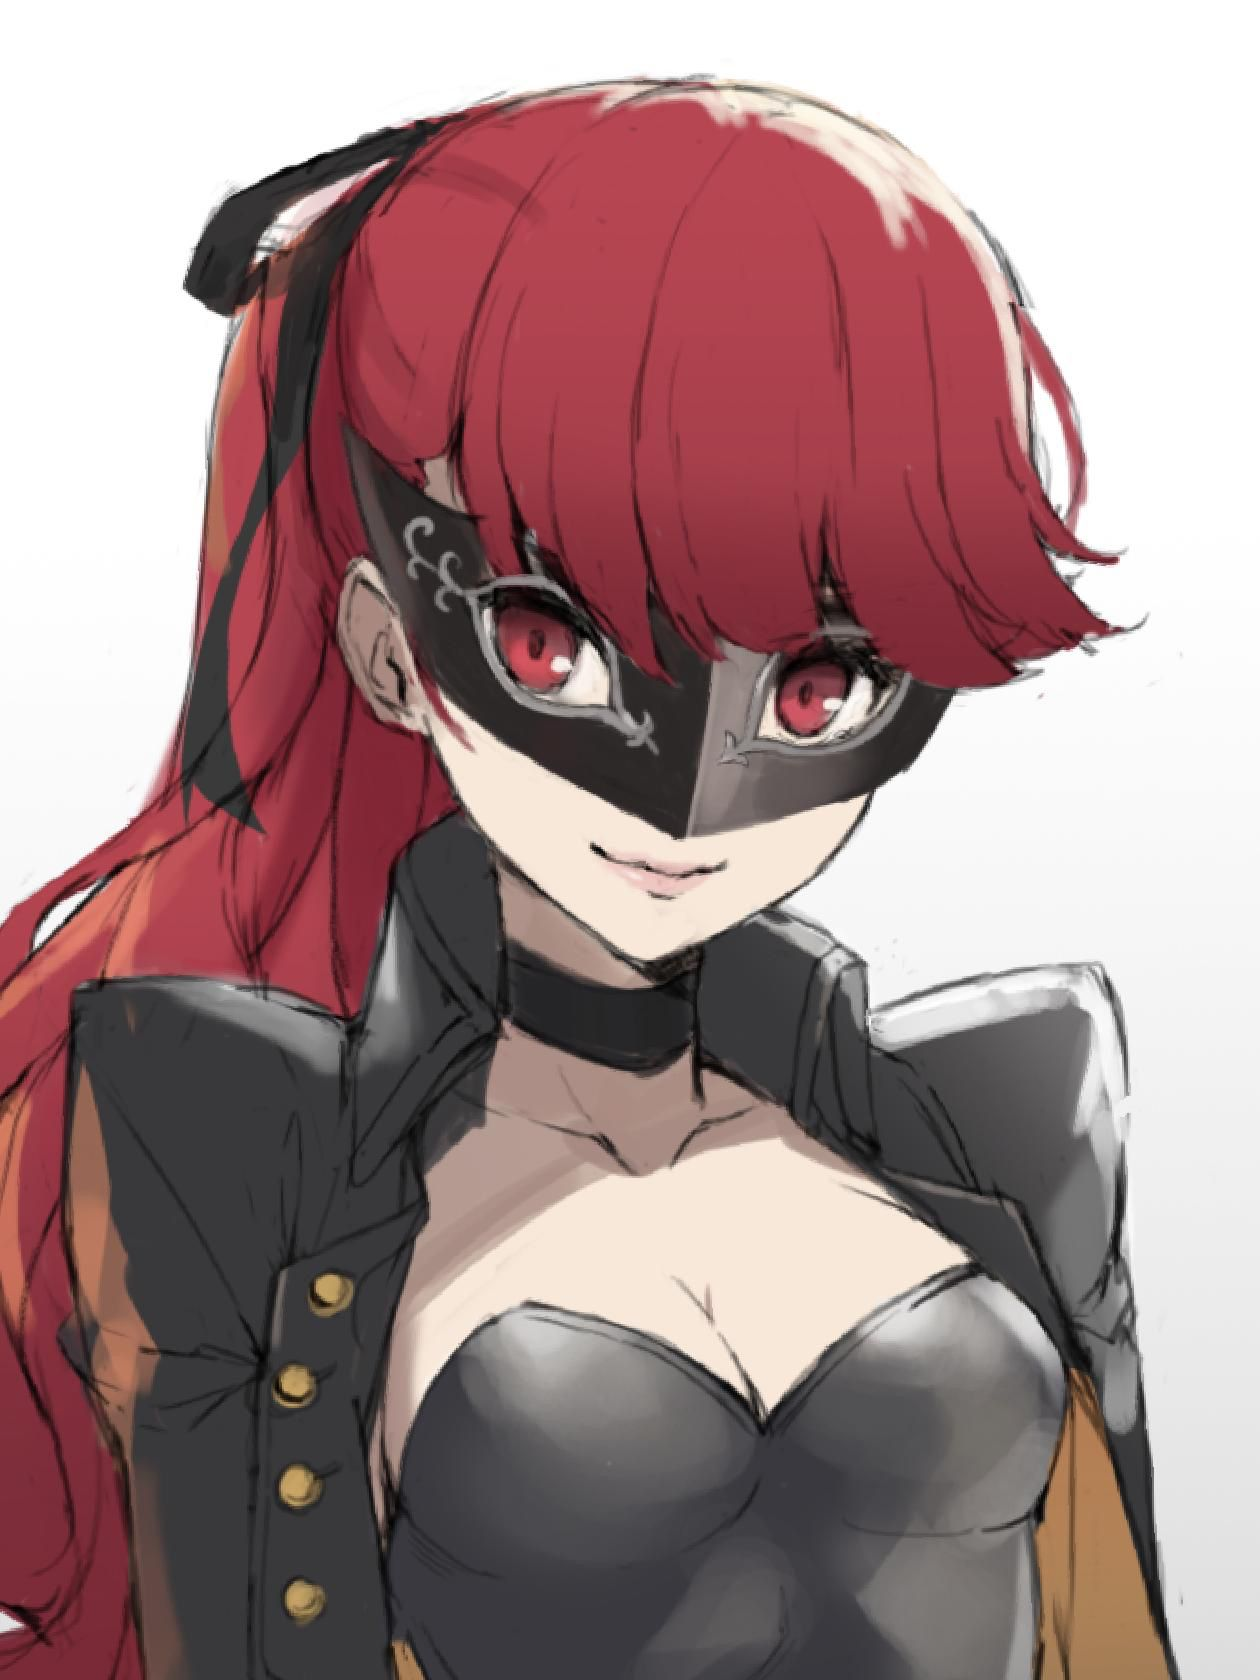 Persona 9 Royal  Persona 9 anime, Persona 9 joker, Persona 9